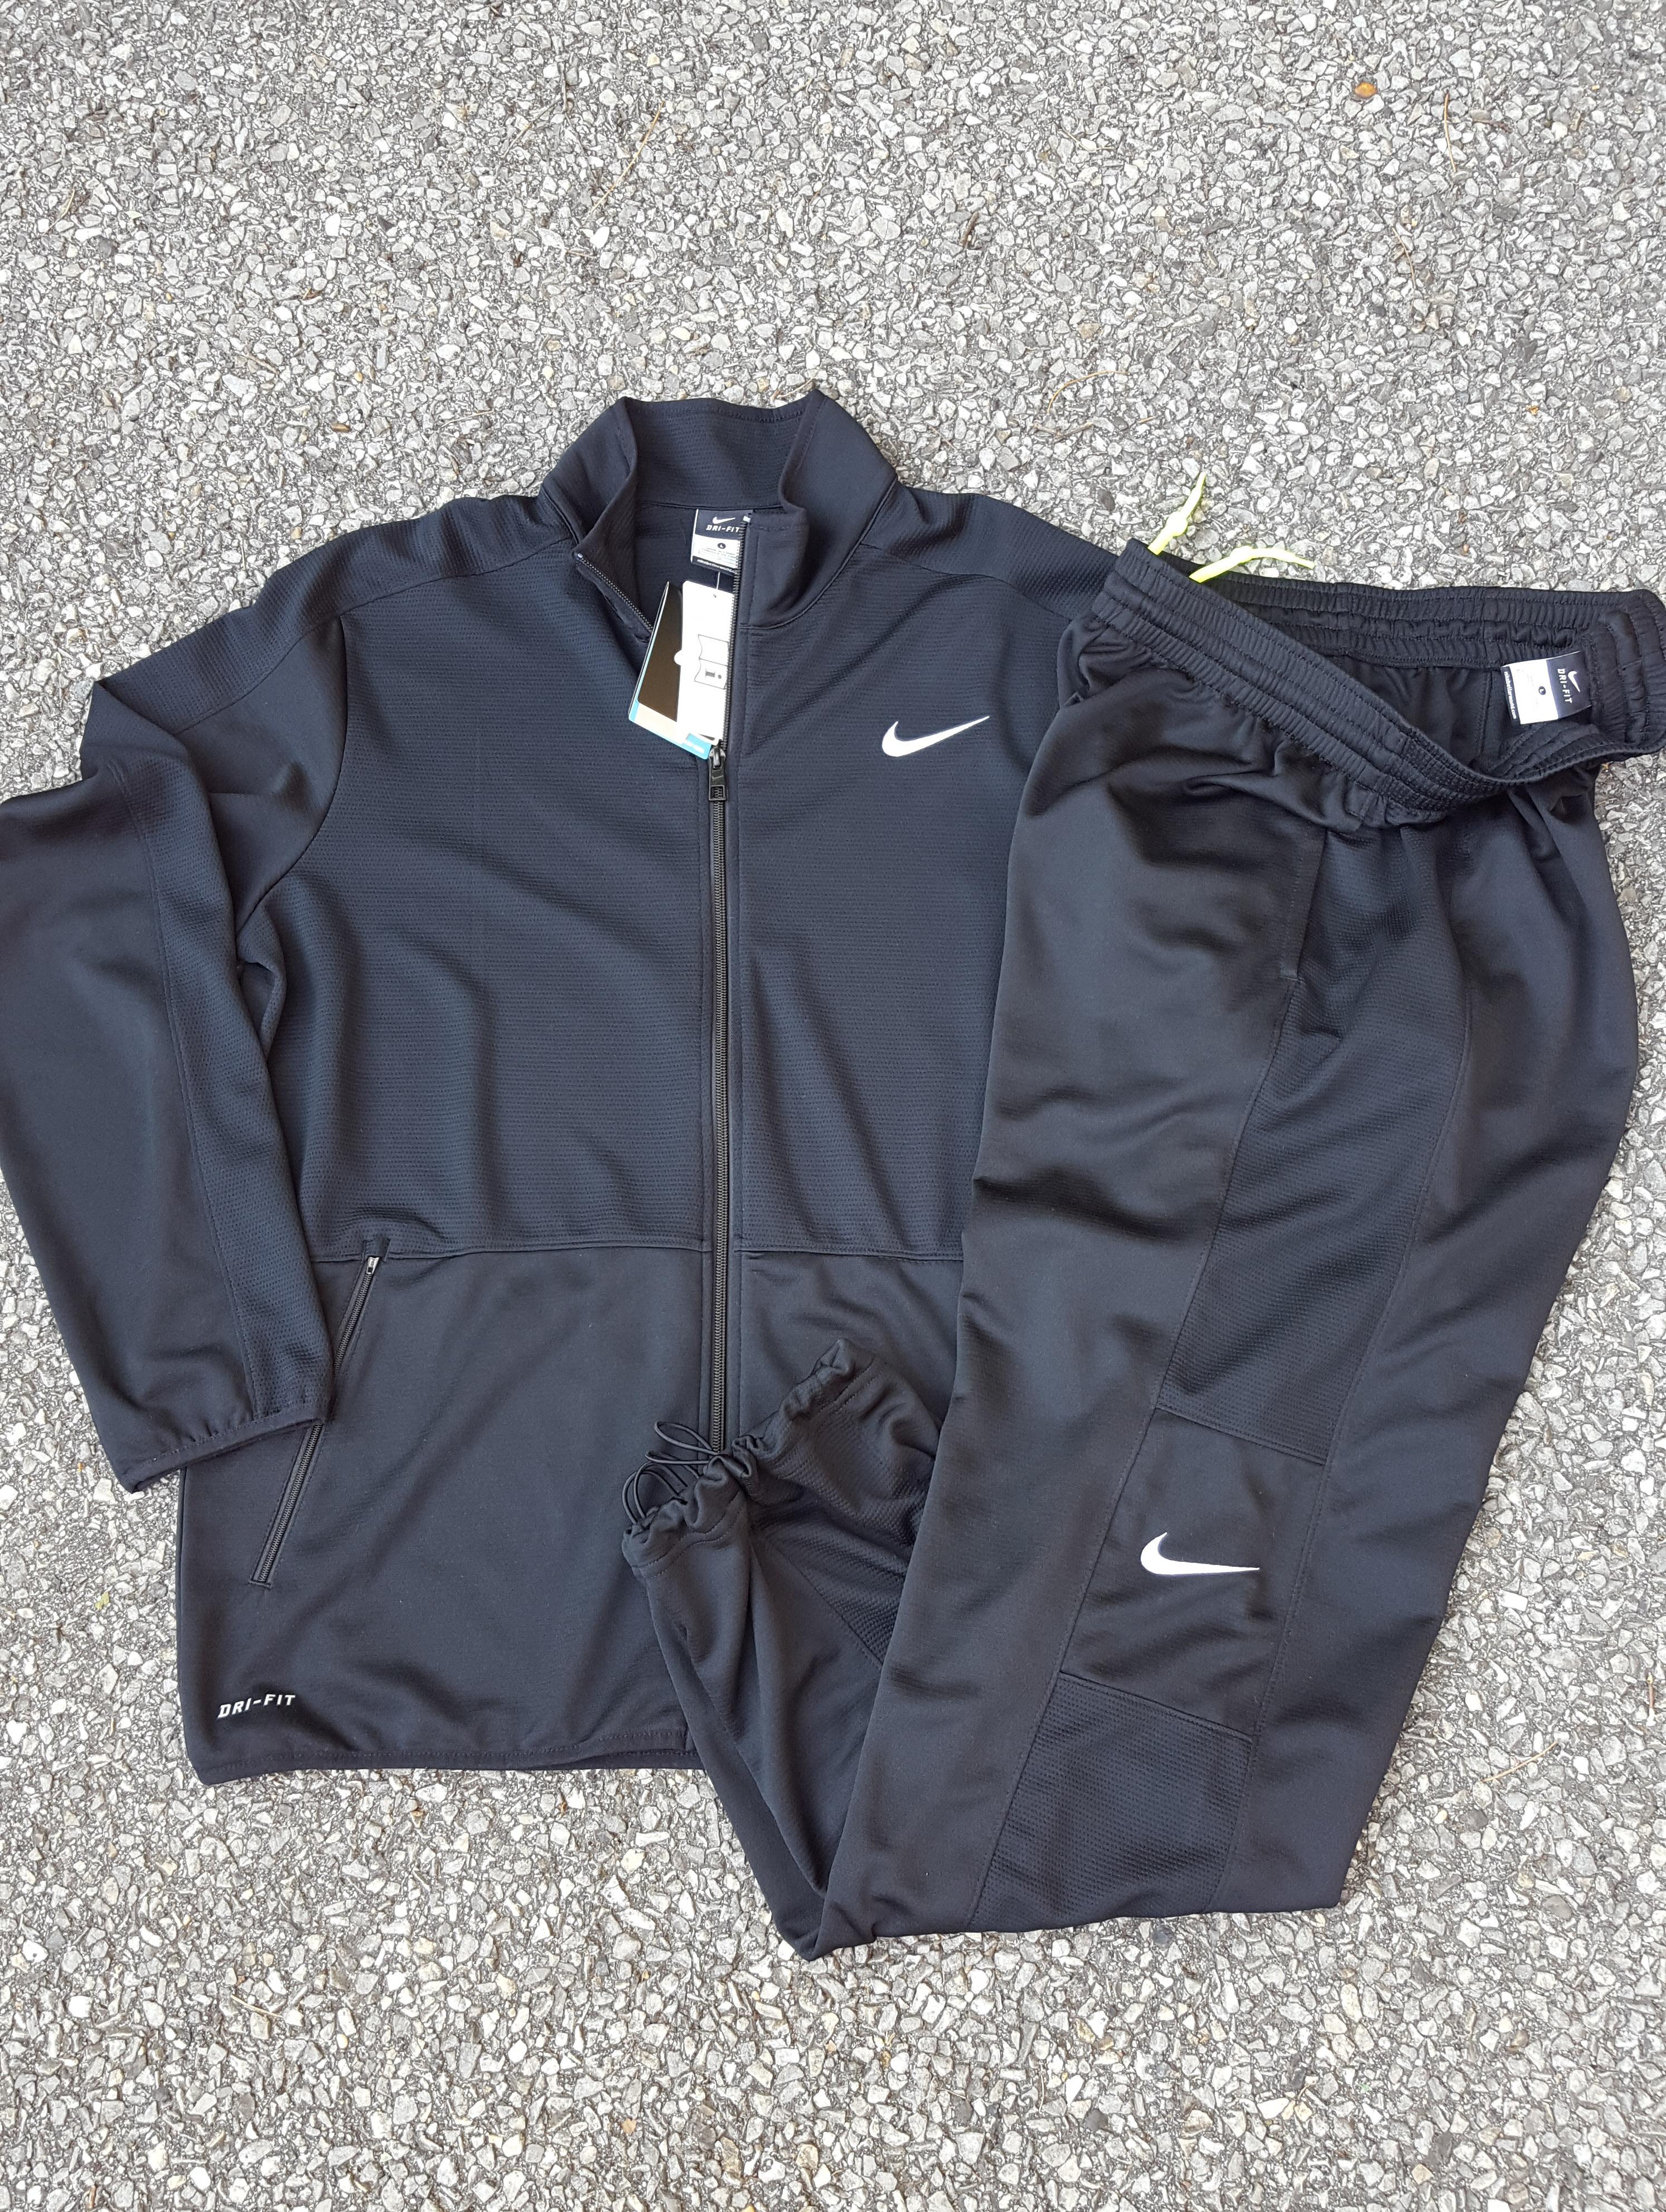 c219621e8b3f Nike Nike DRI-FIT Basketball Warm Up Suit Jacket   Pants w Bungee ...